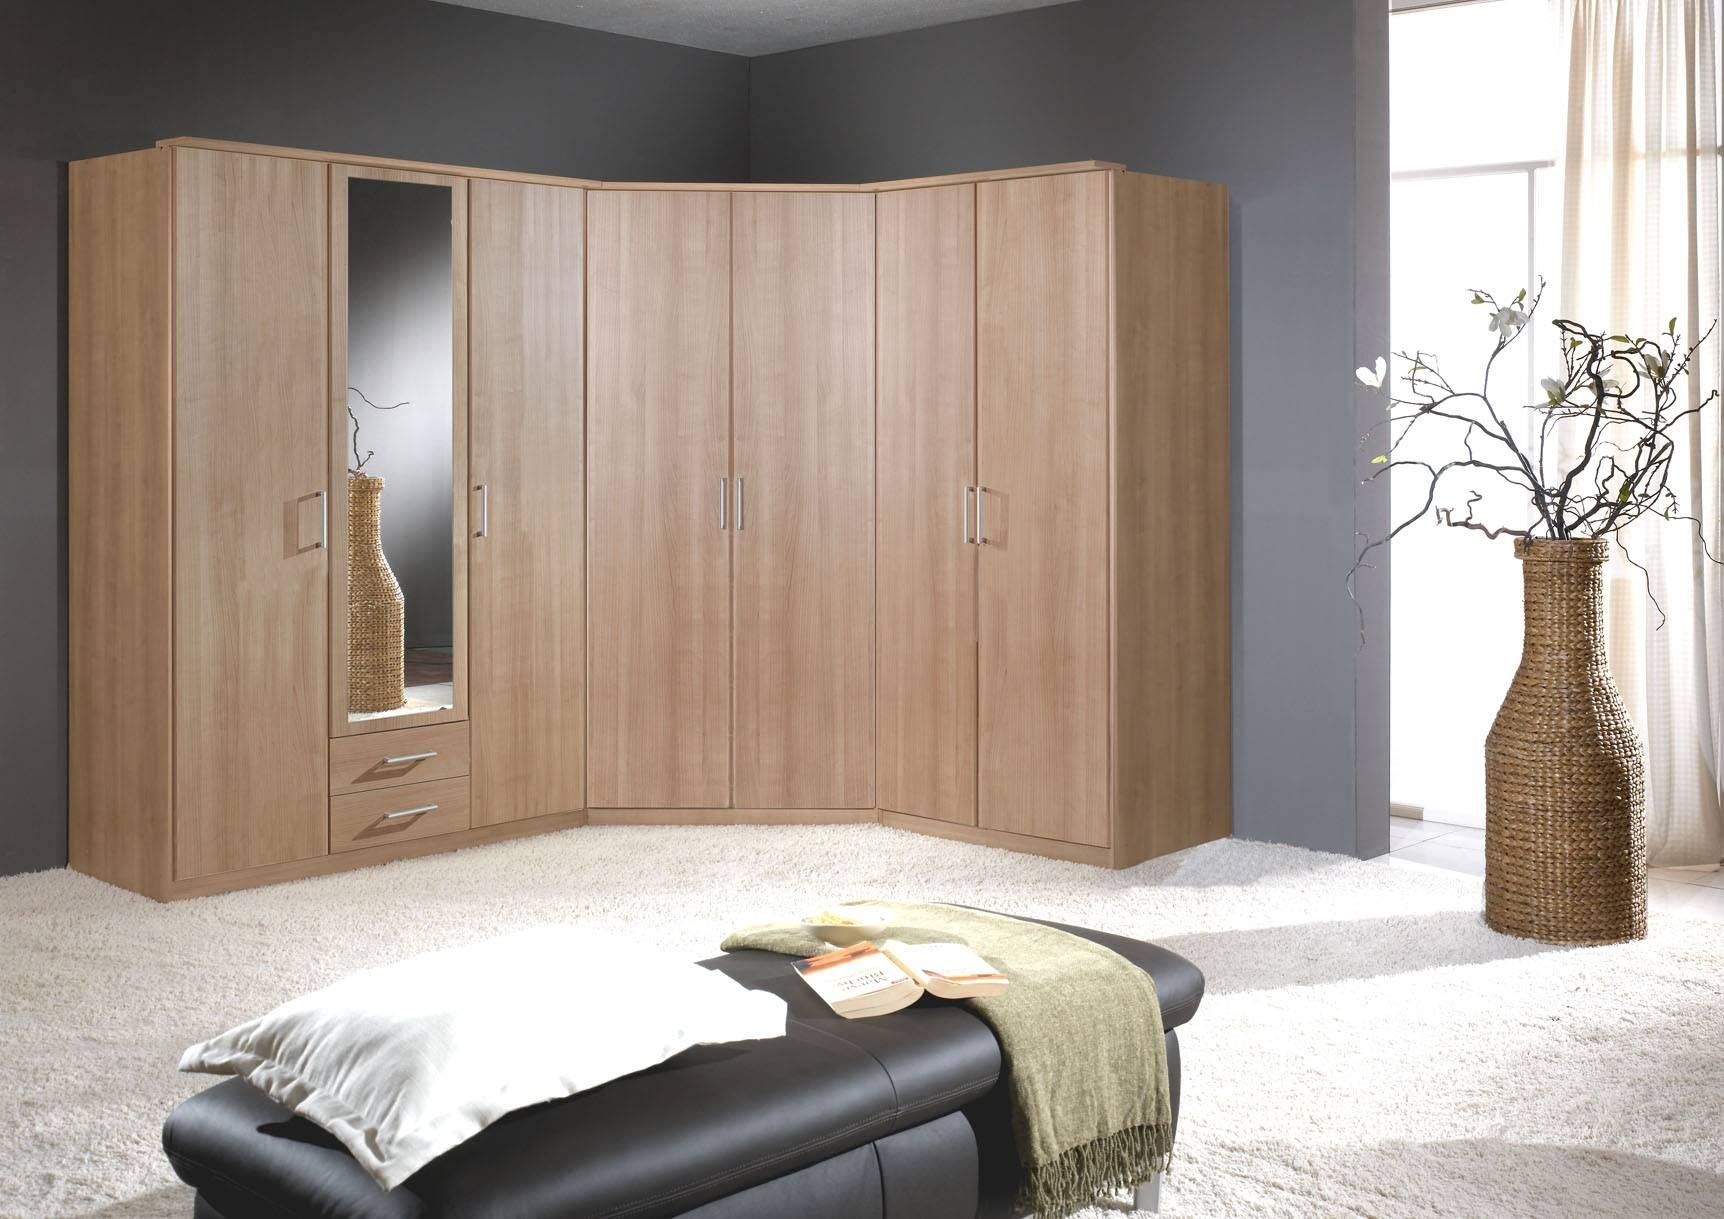 Small Corner Bedroom Units Best Ideas About Bedrooms Nursery Kids Regarding Small Corner Wardrobes (View 11 of 15)